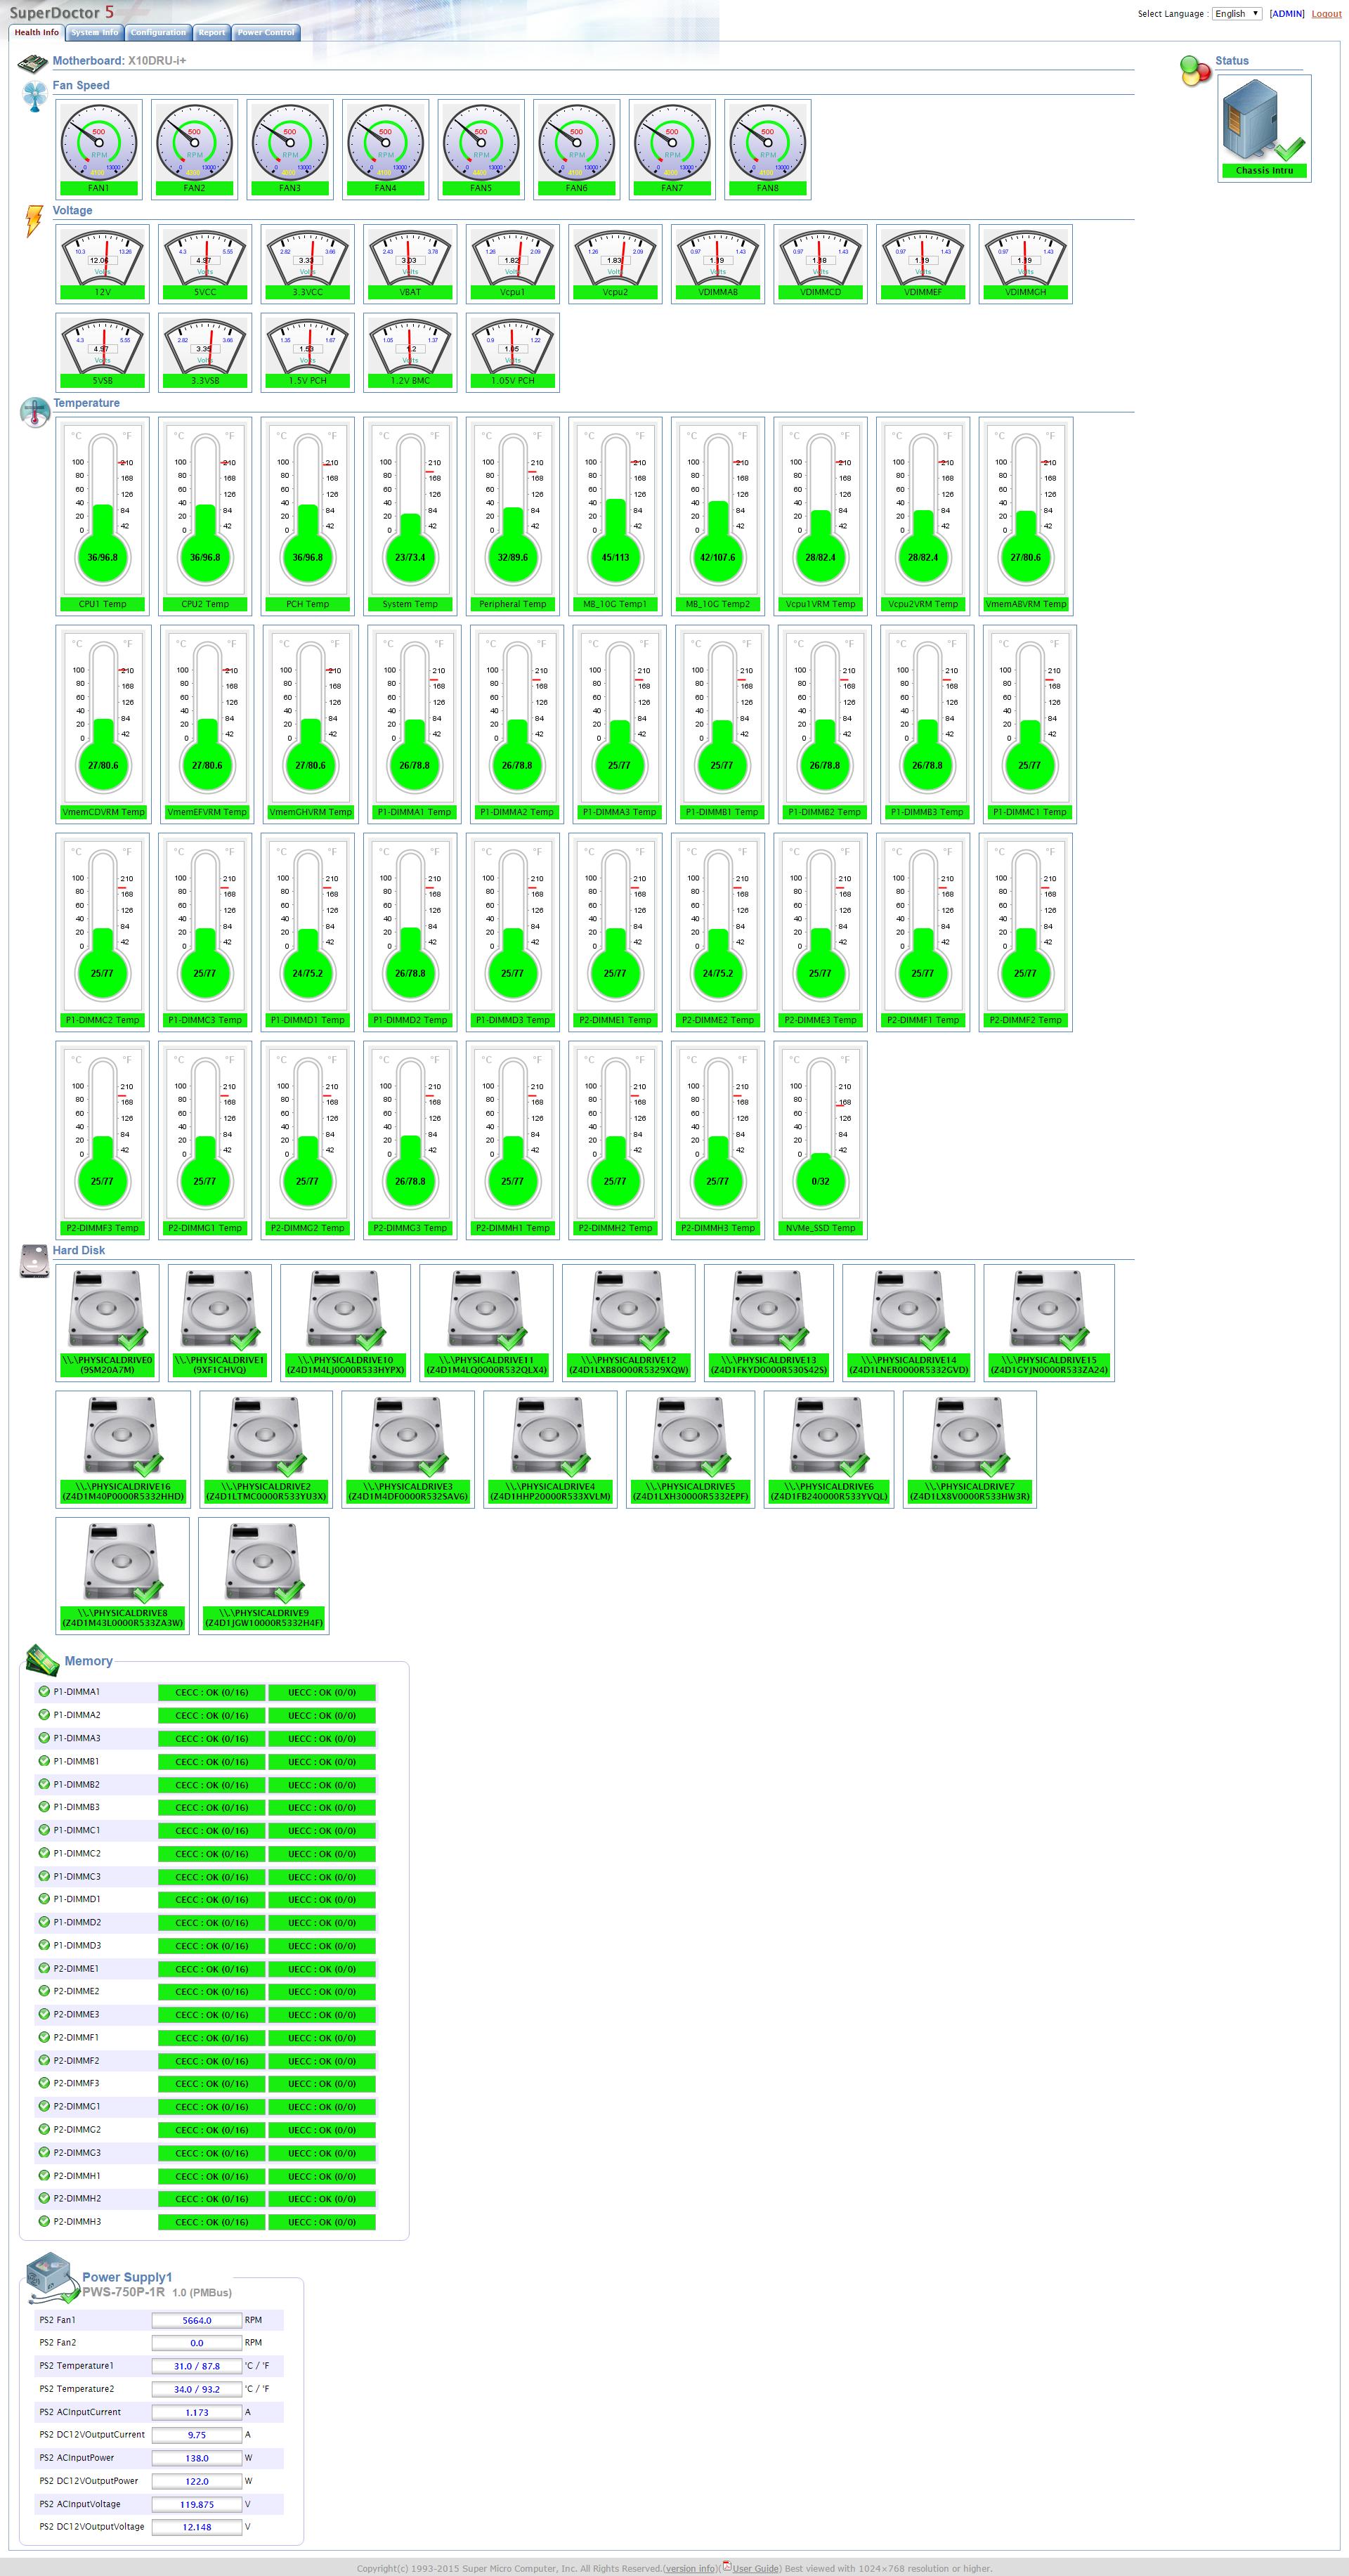 Supermicro SuperDoctor® 5 | Supermicro Server Management